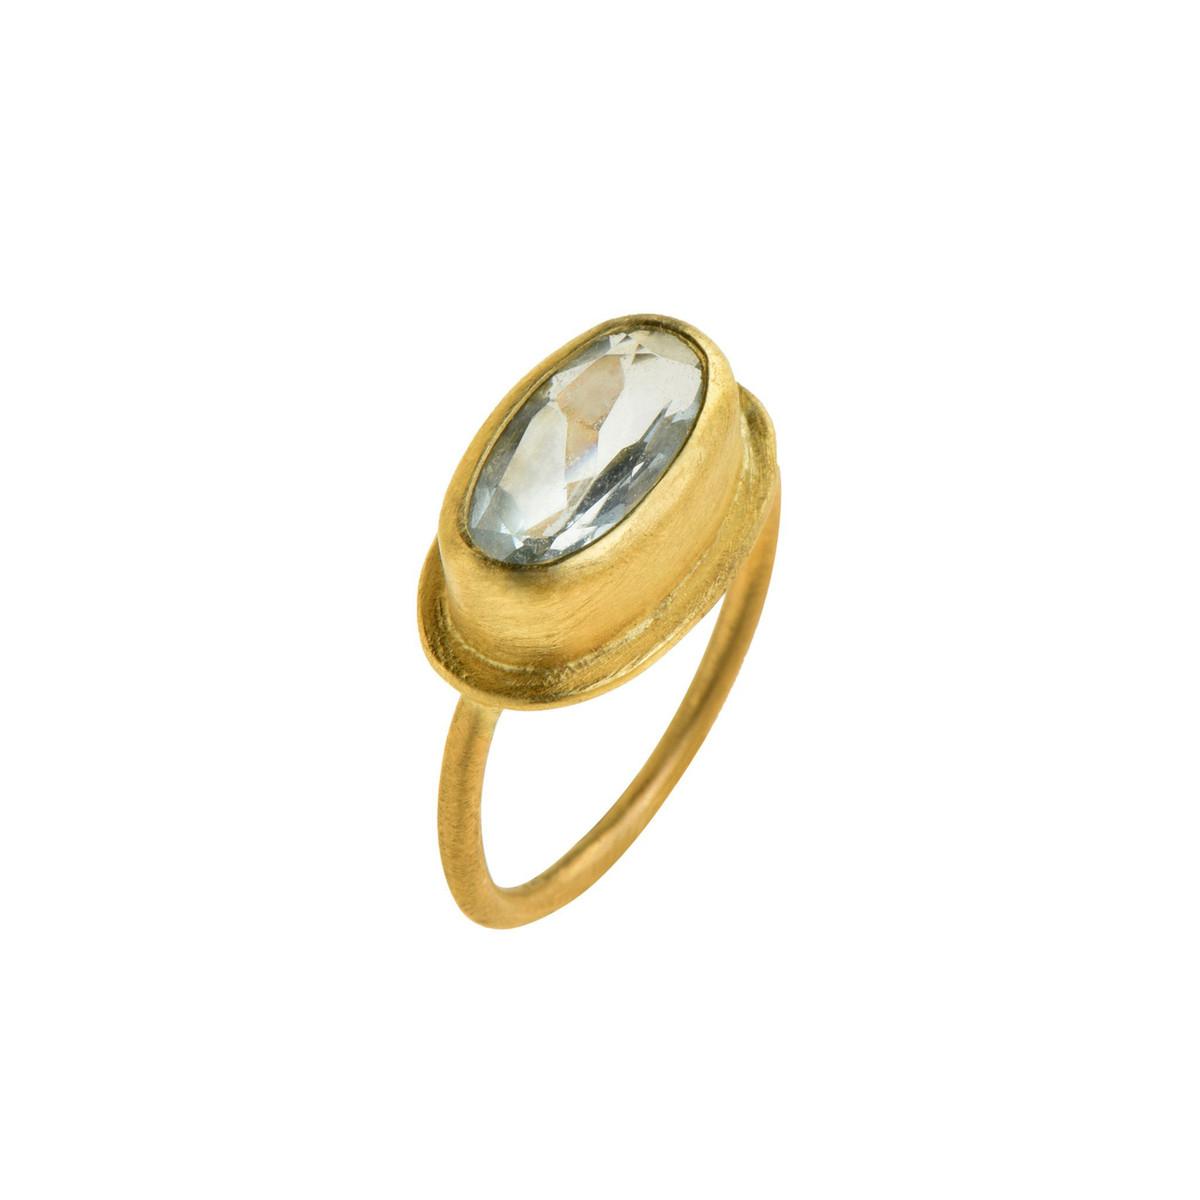 Azure Aquamarine Ring by Nava Zahavi  - New Arrival